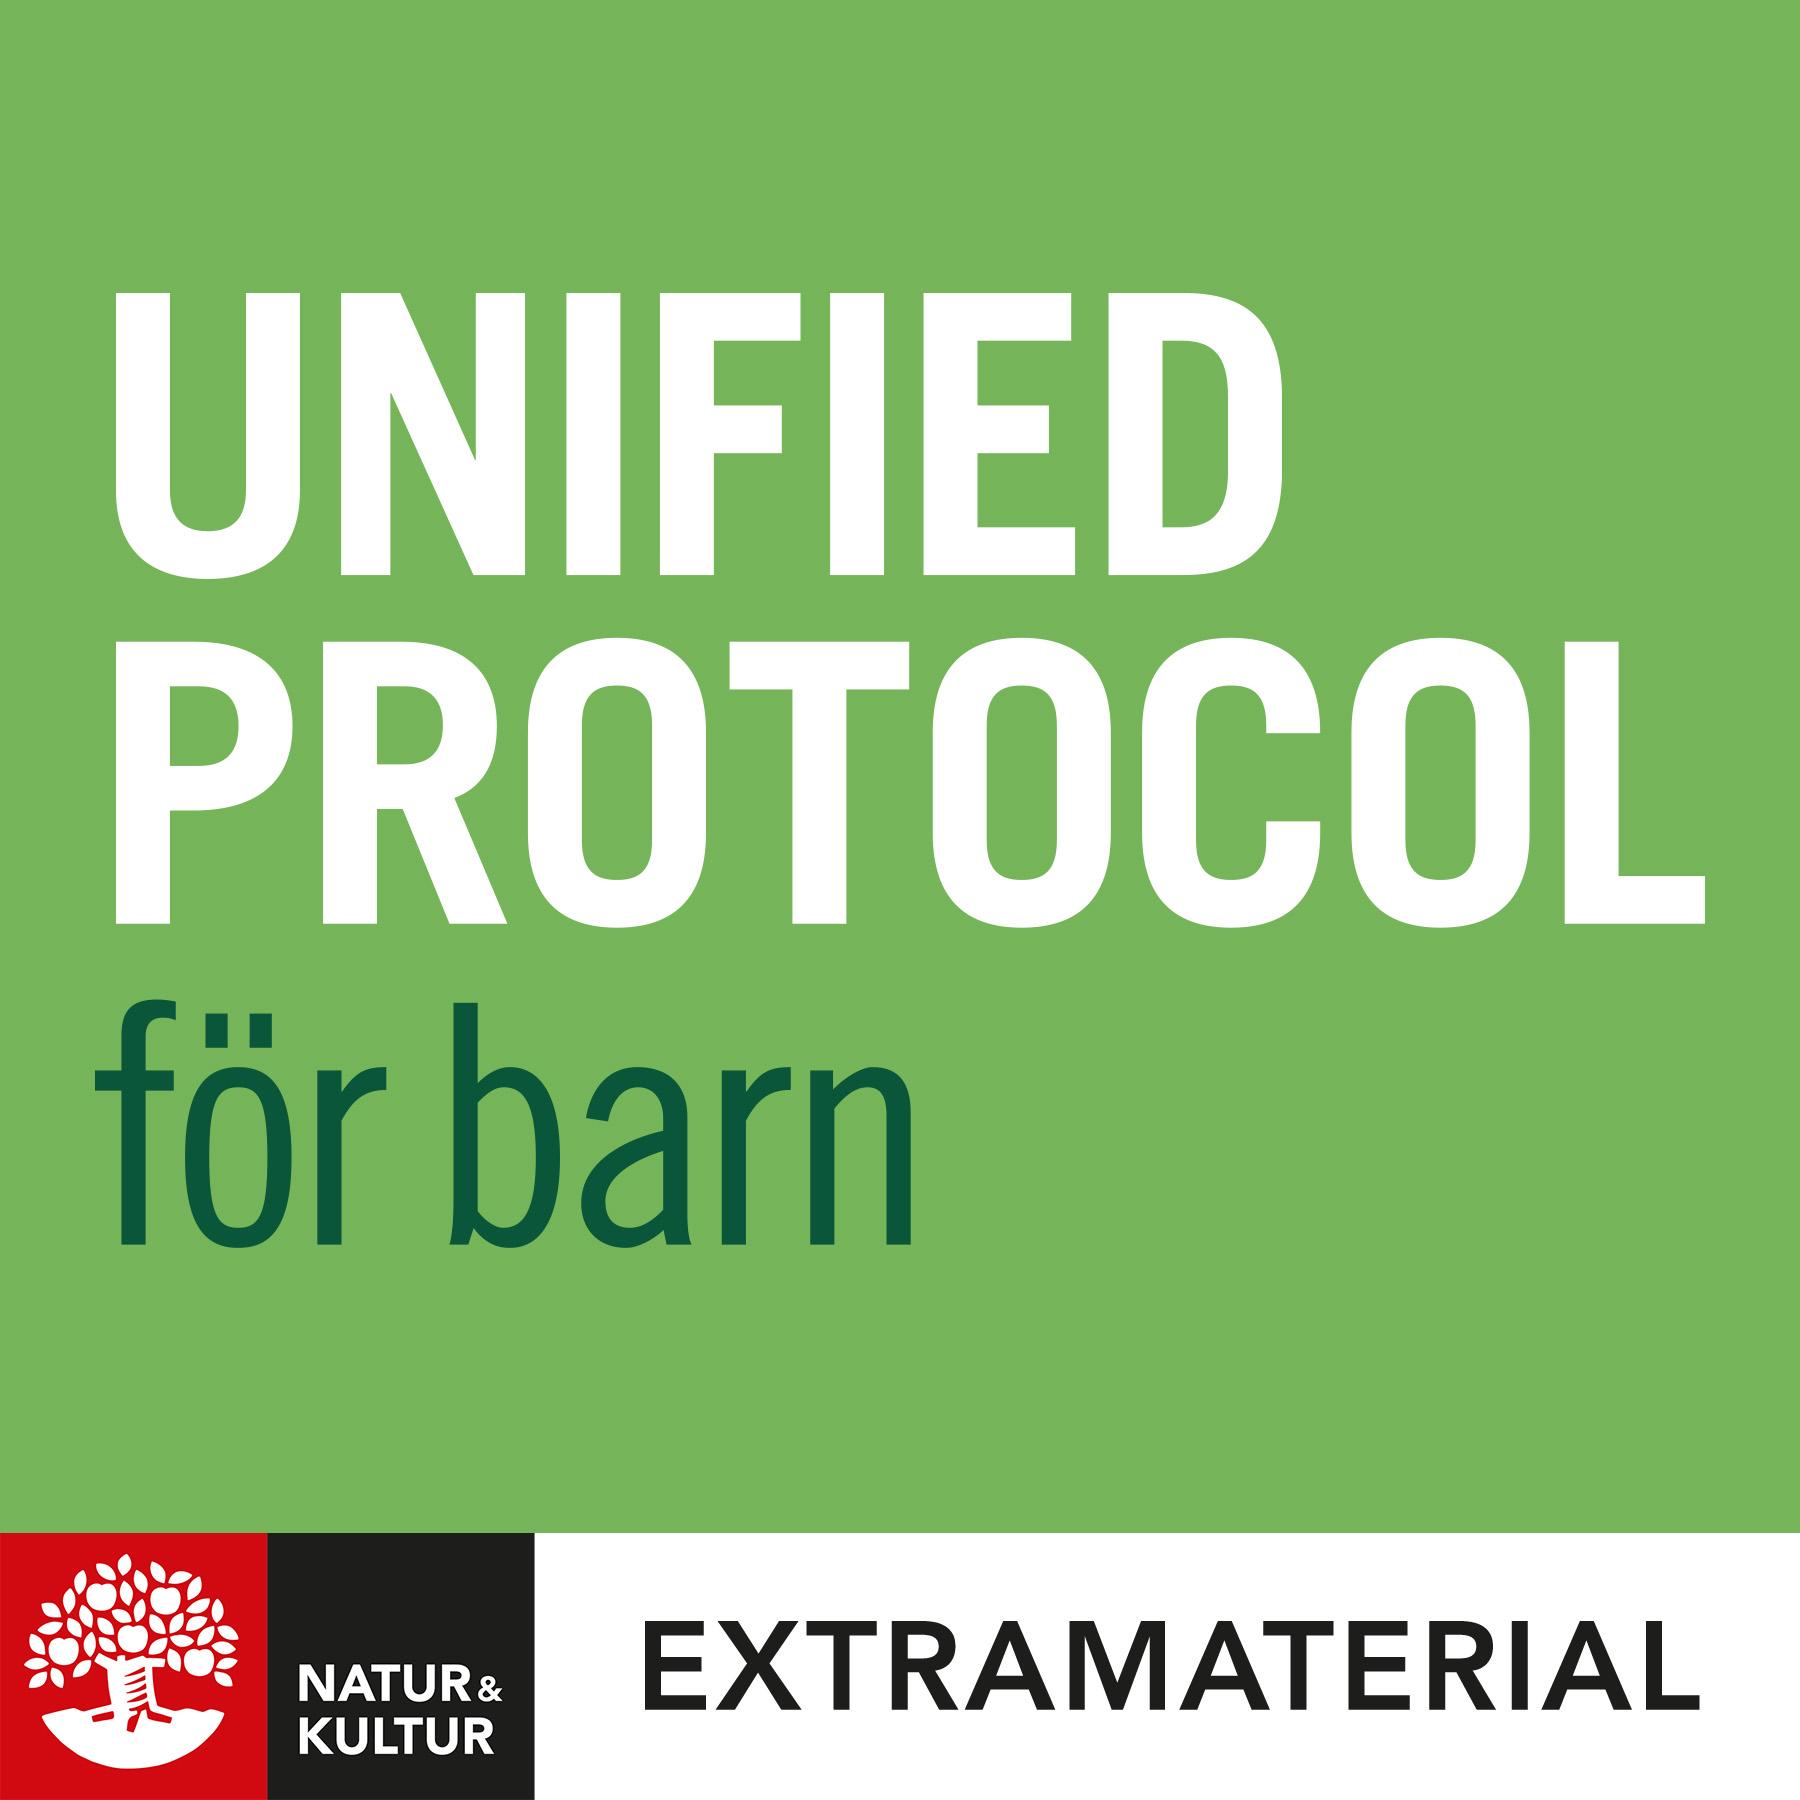 Unified protocol för barn